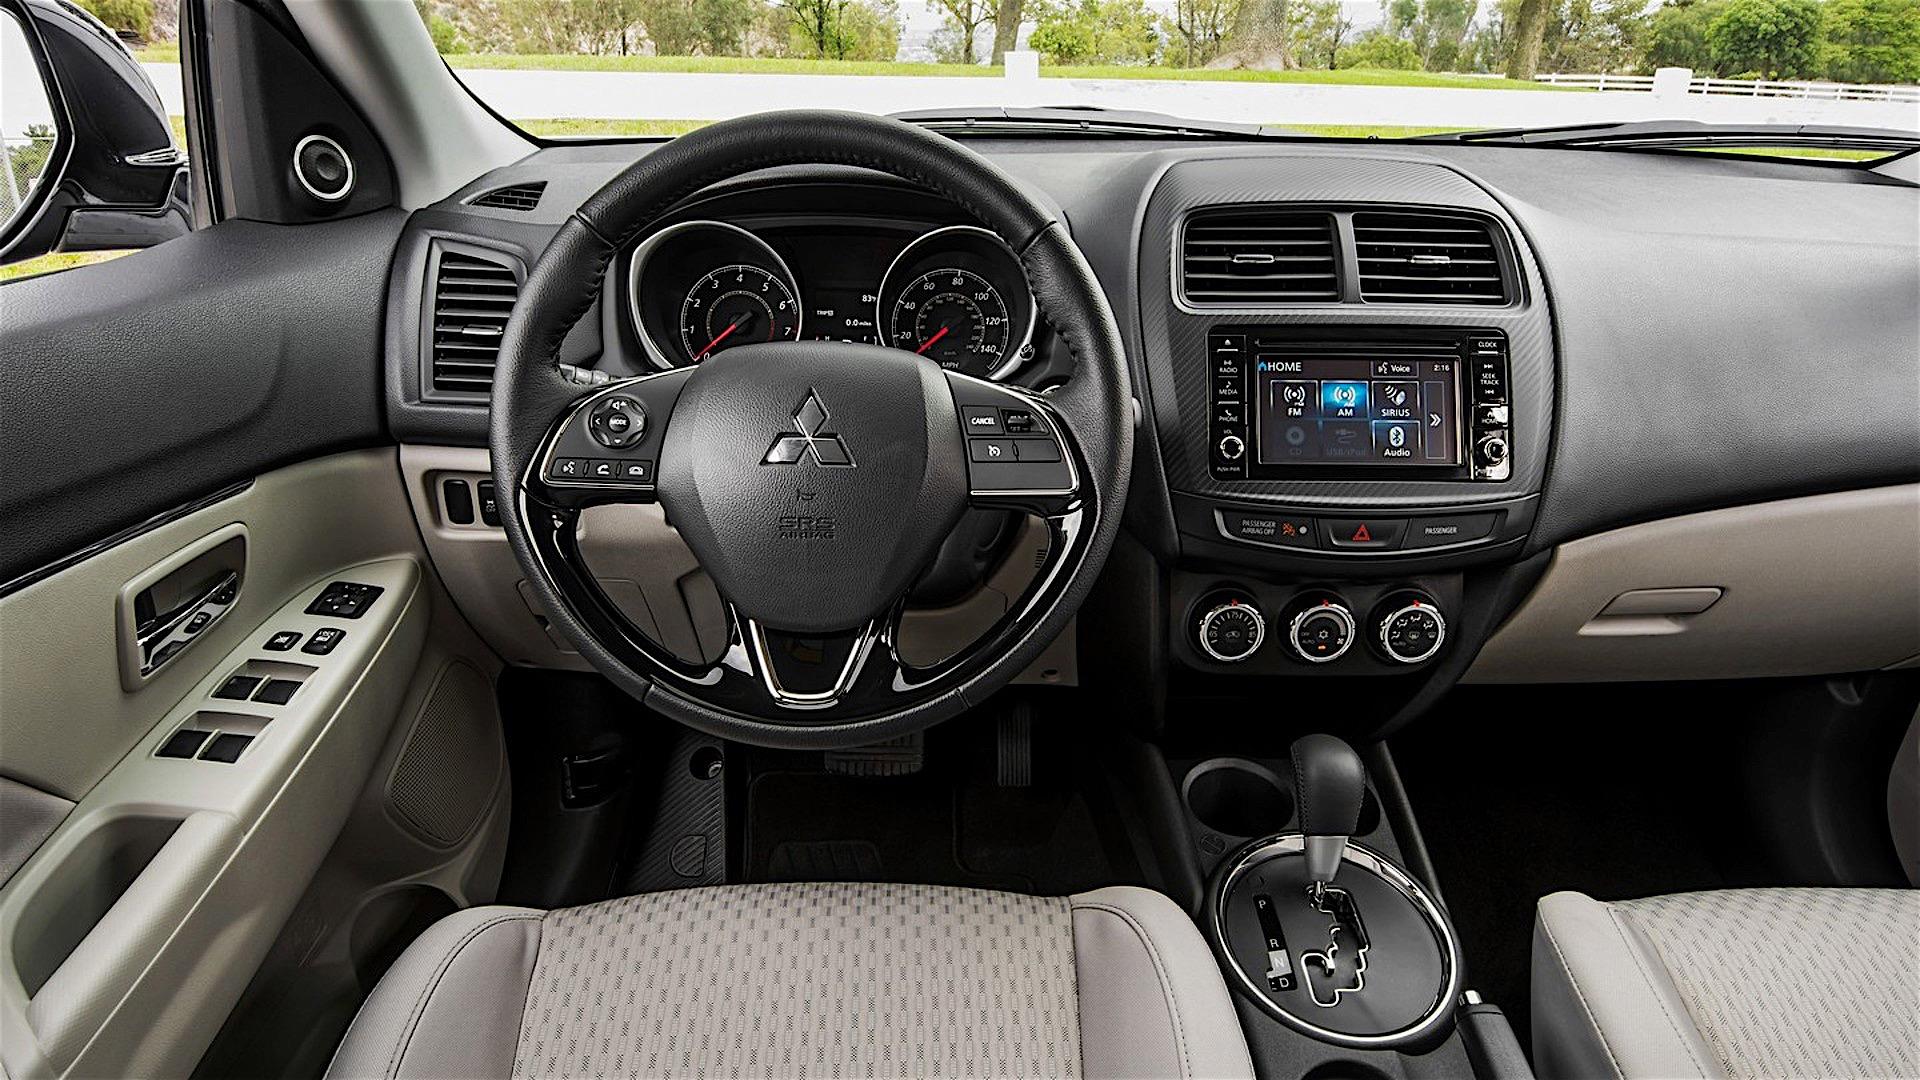 Mitsubishi Recalls CVT Transmission For